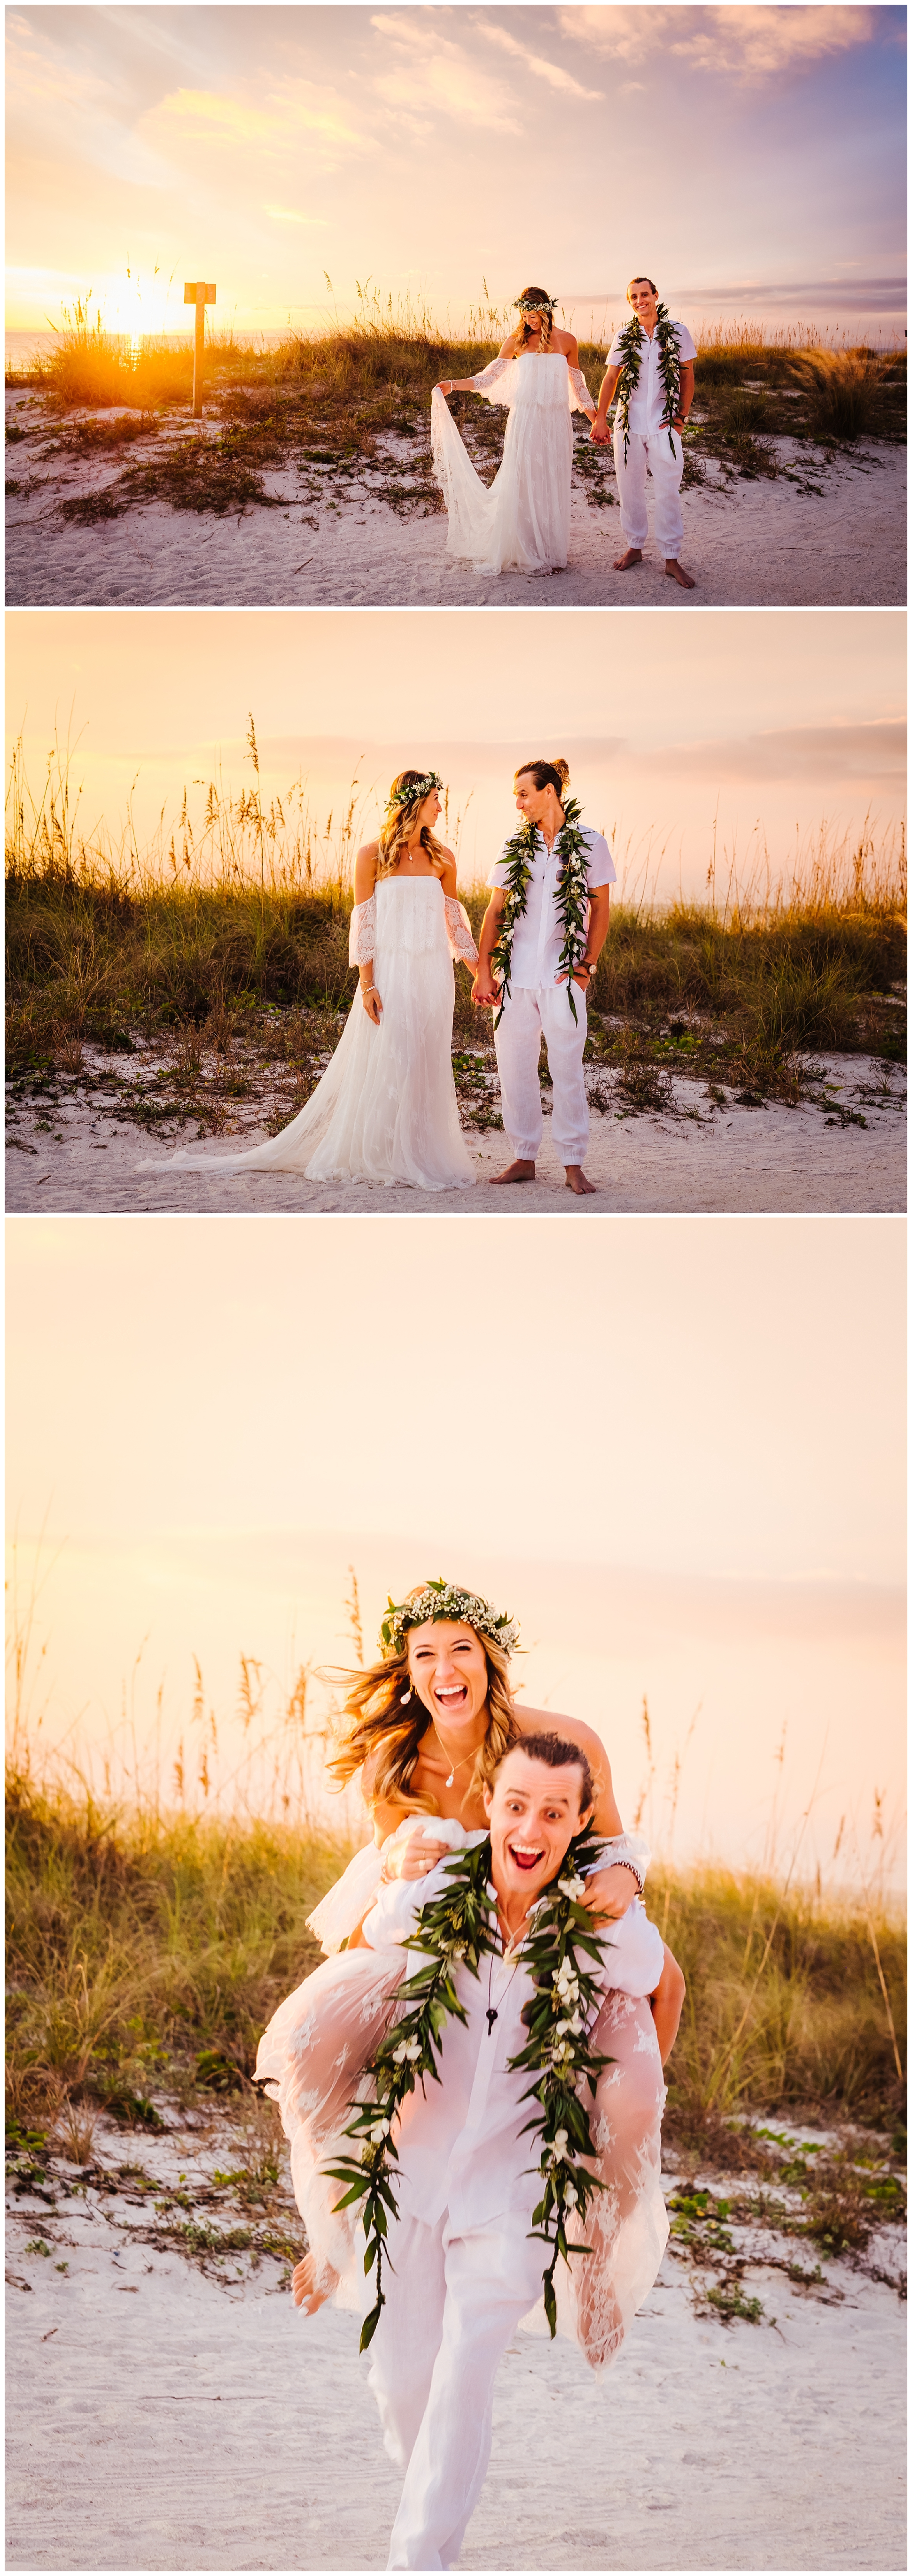 tampa-bay-wedding-photographer-barefoot-post-card-inn-tropical-hawaiin-lei-pink-pineapples-flower-crown_0181.jpg